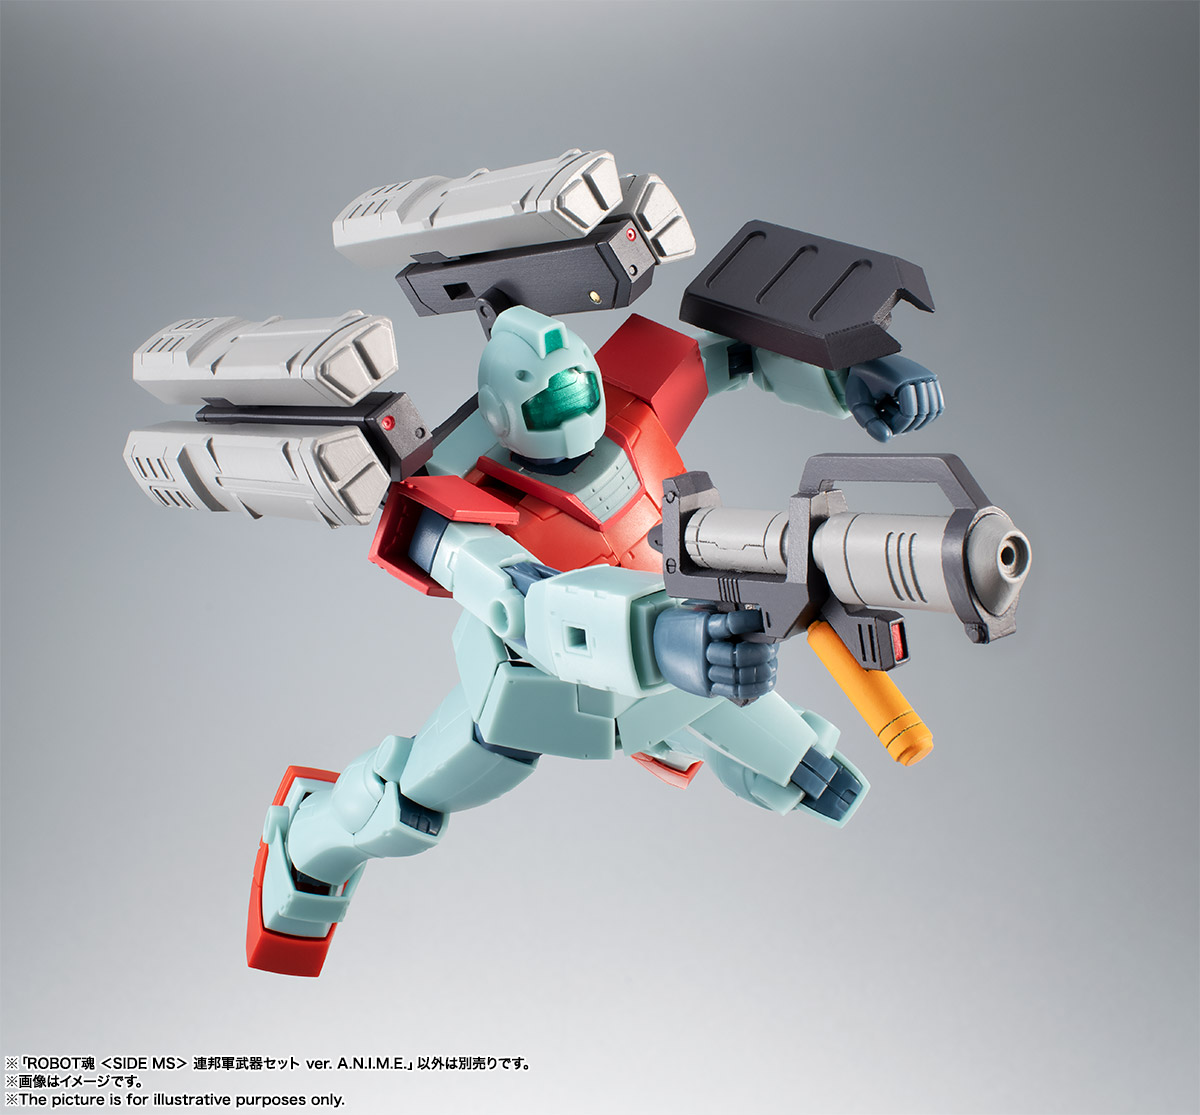 ROBOT魂〈SIDE MS〉『連邦軍武器セット ver. A.N.I.M.E.』ガンダム 完成品フィギュア-007